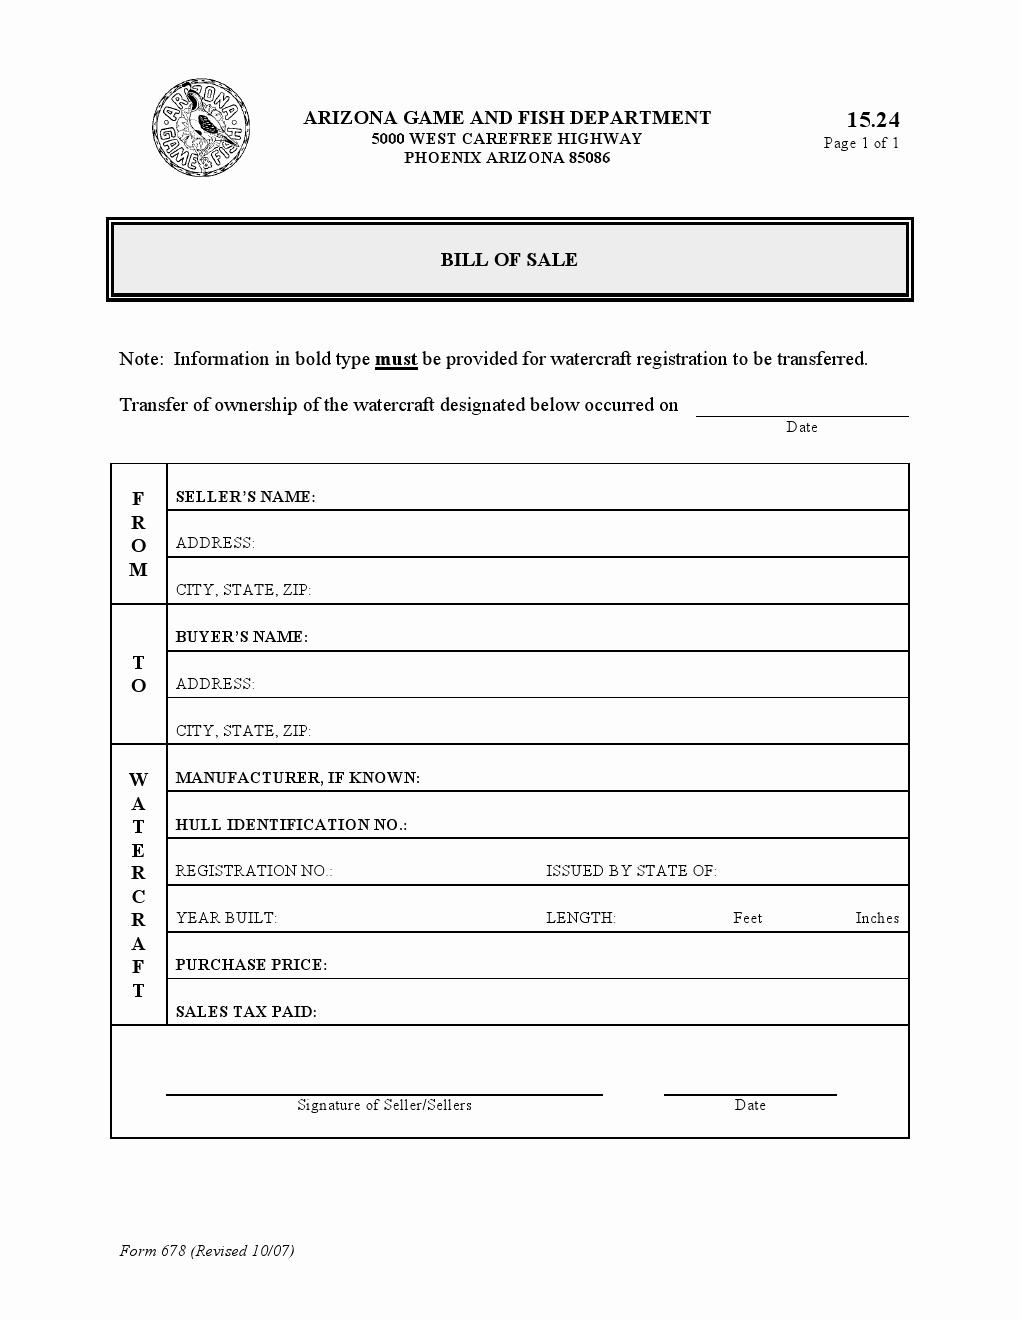 Watercraft Bill Of Sale Unique Free Arizona Watercraft Bill Of Sale form Download Pdf